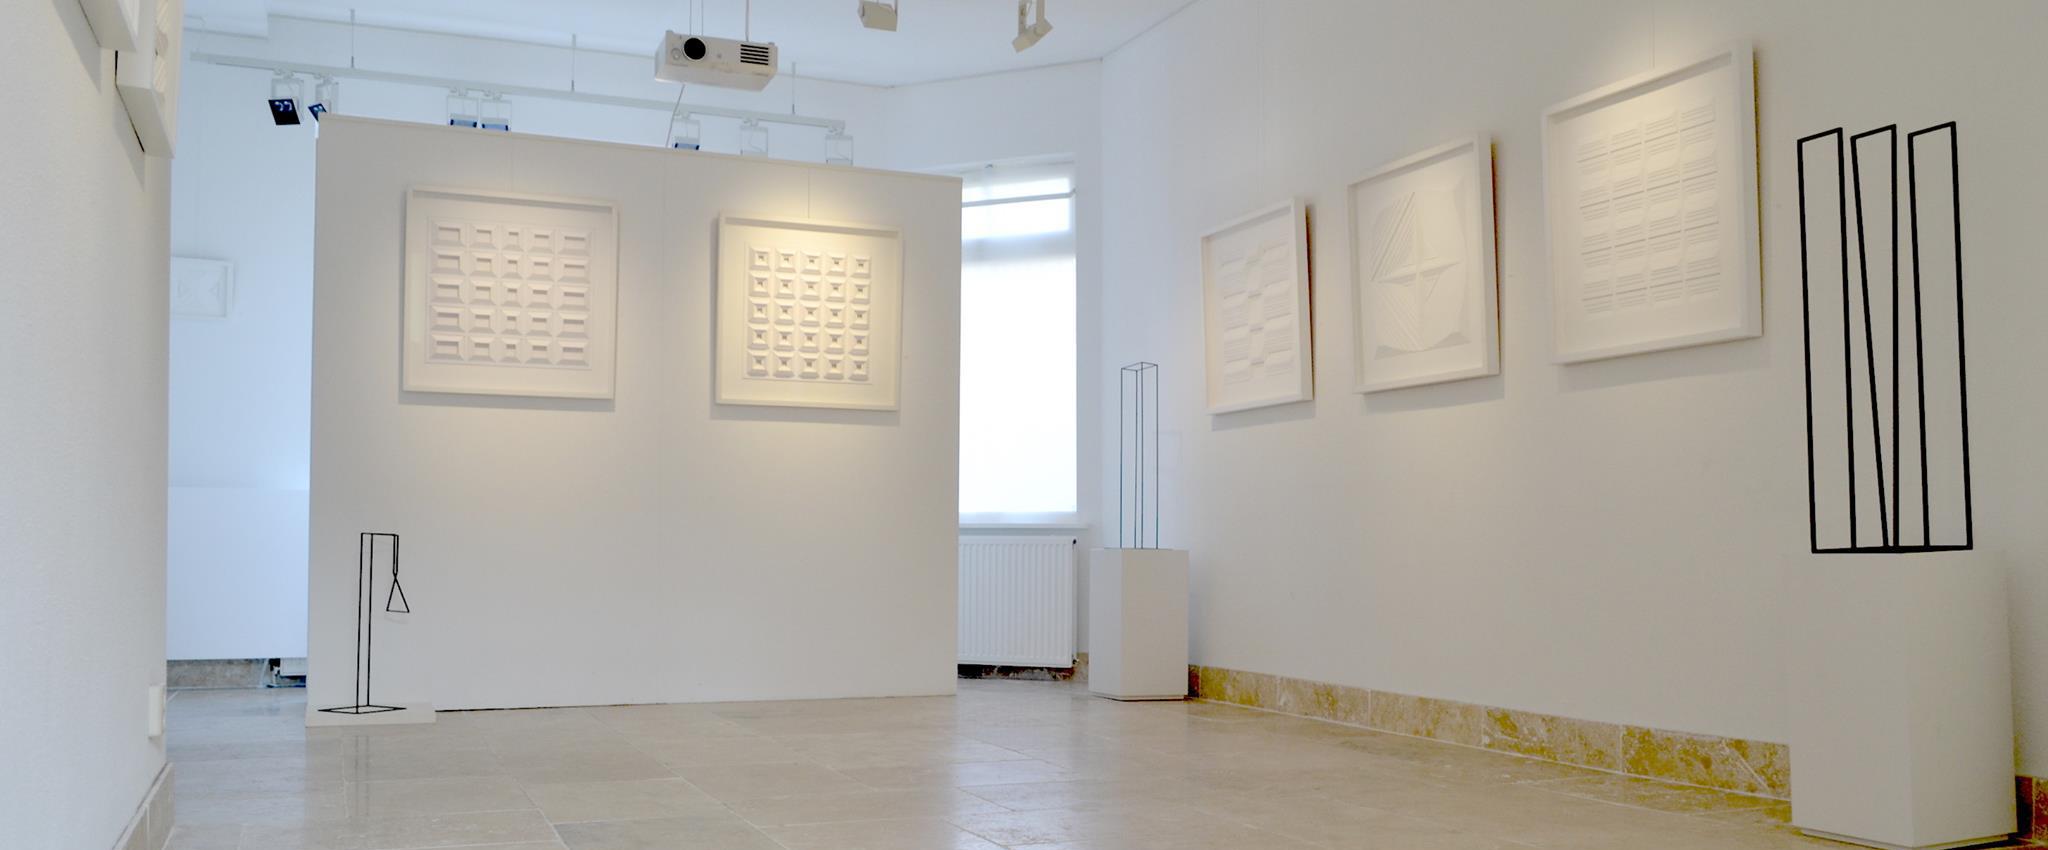 Art gallery o68 in Velp